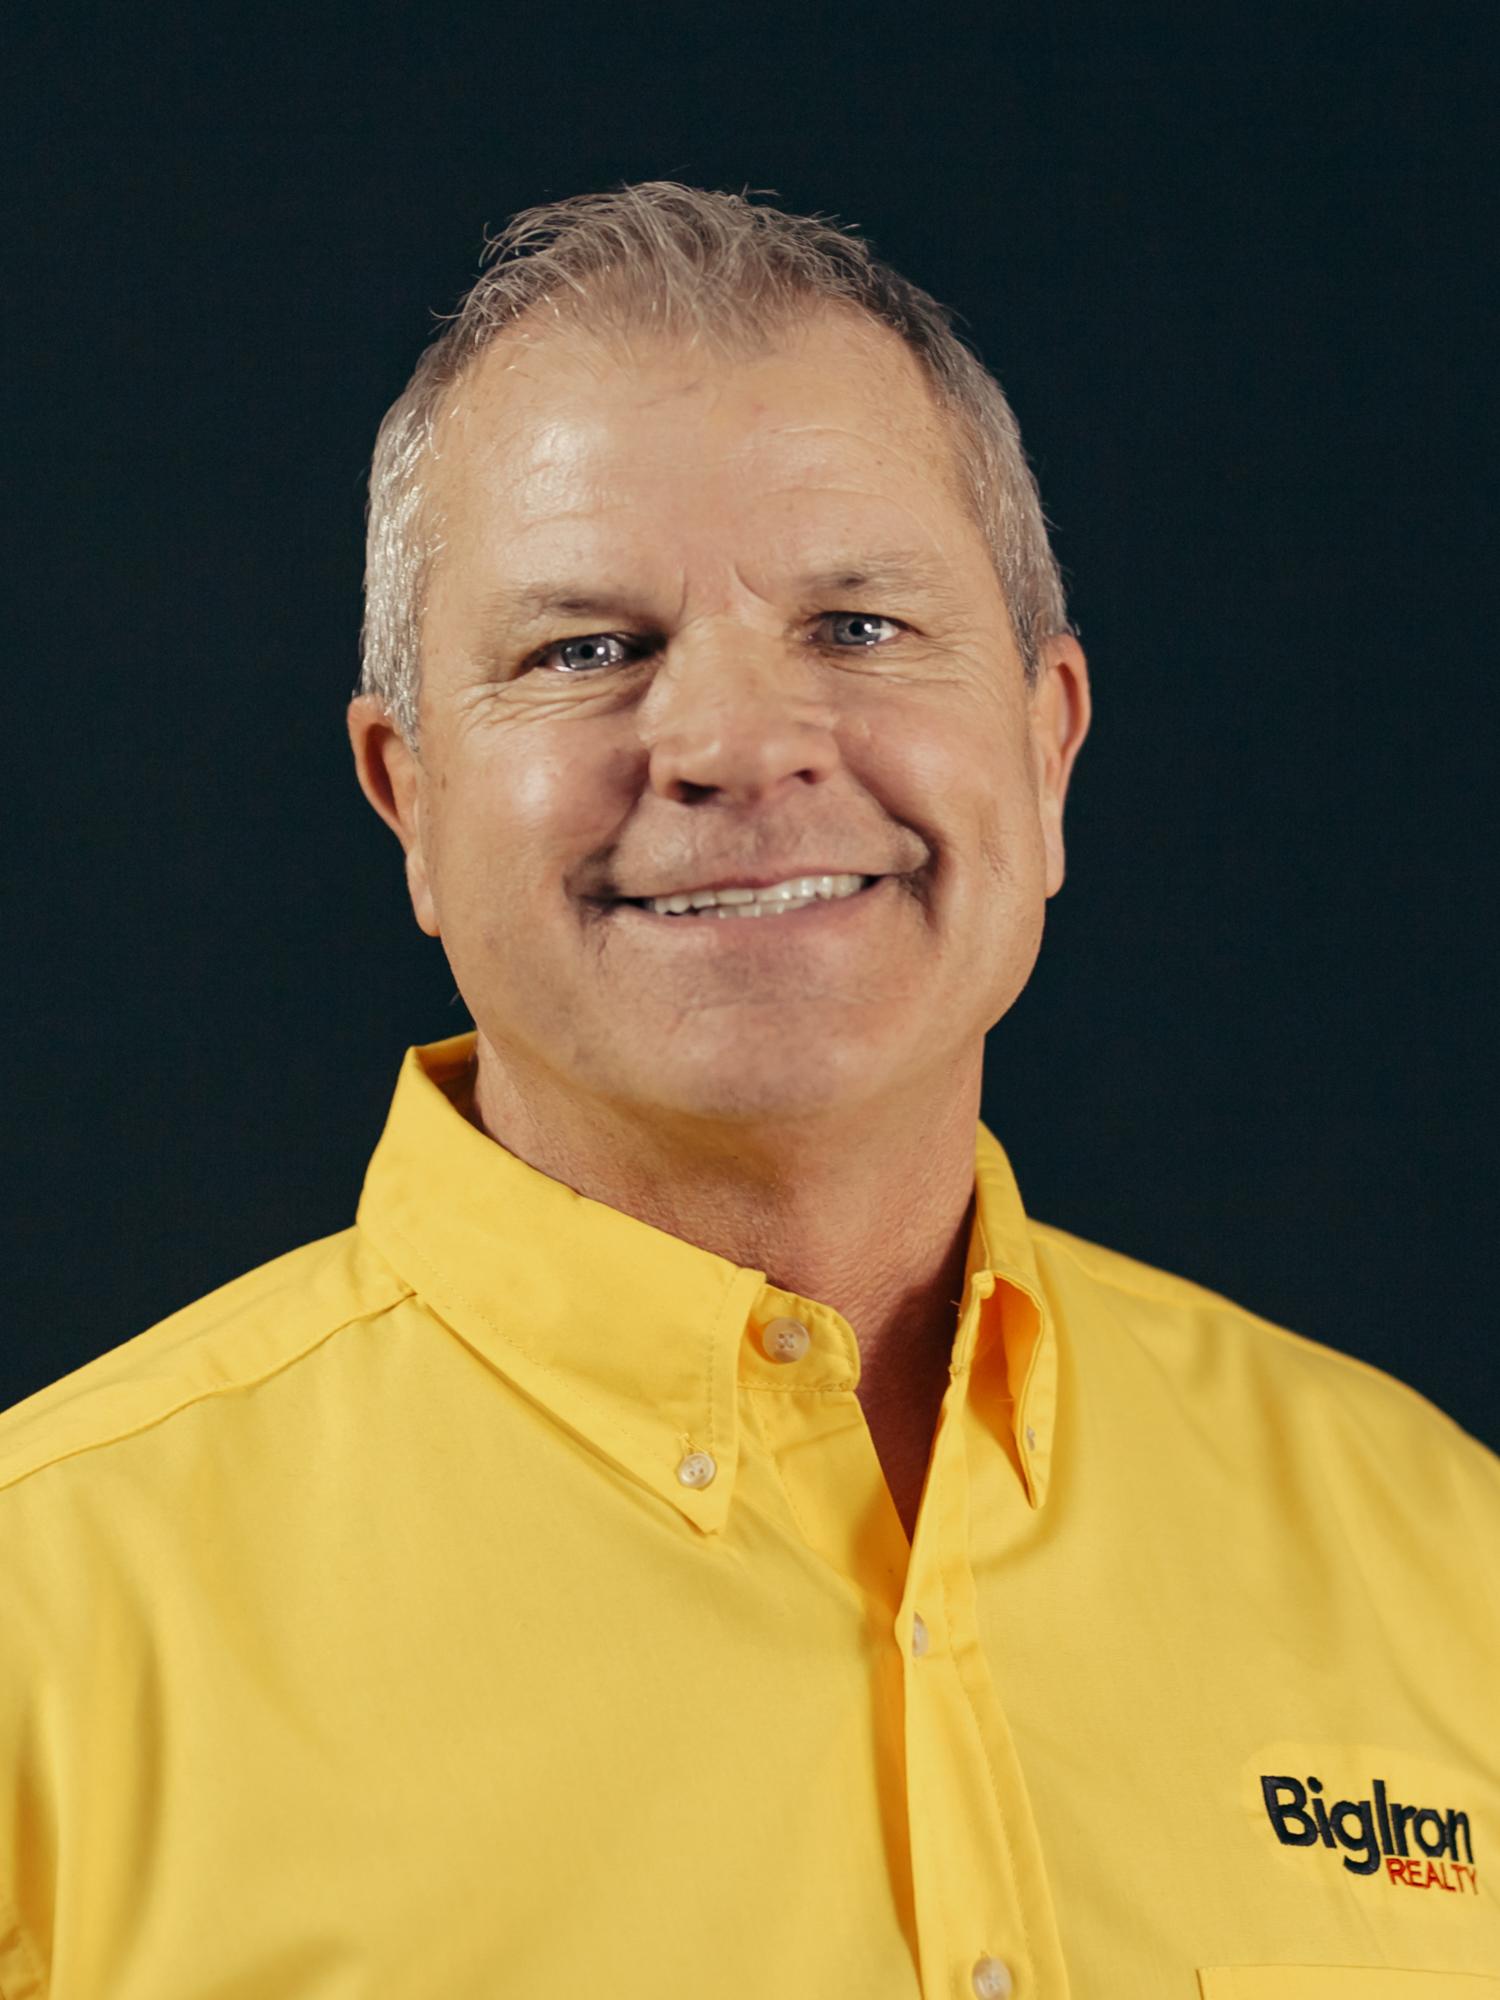 Jerry-Hoegh2-yellow-shirt-150x150.jpg